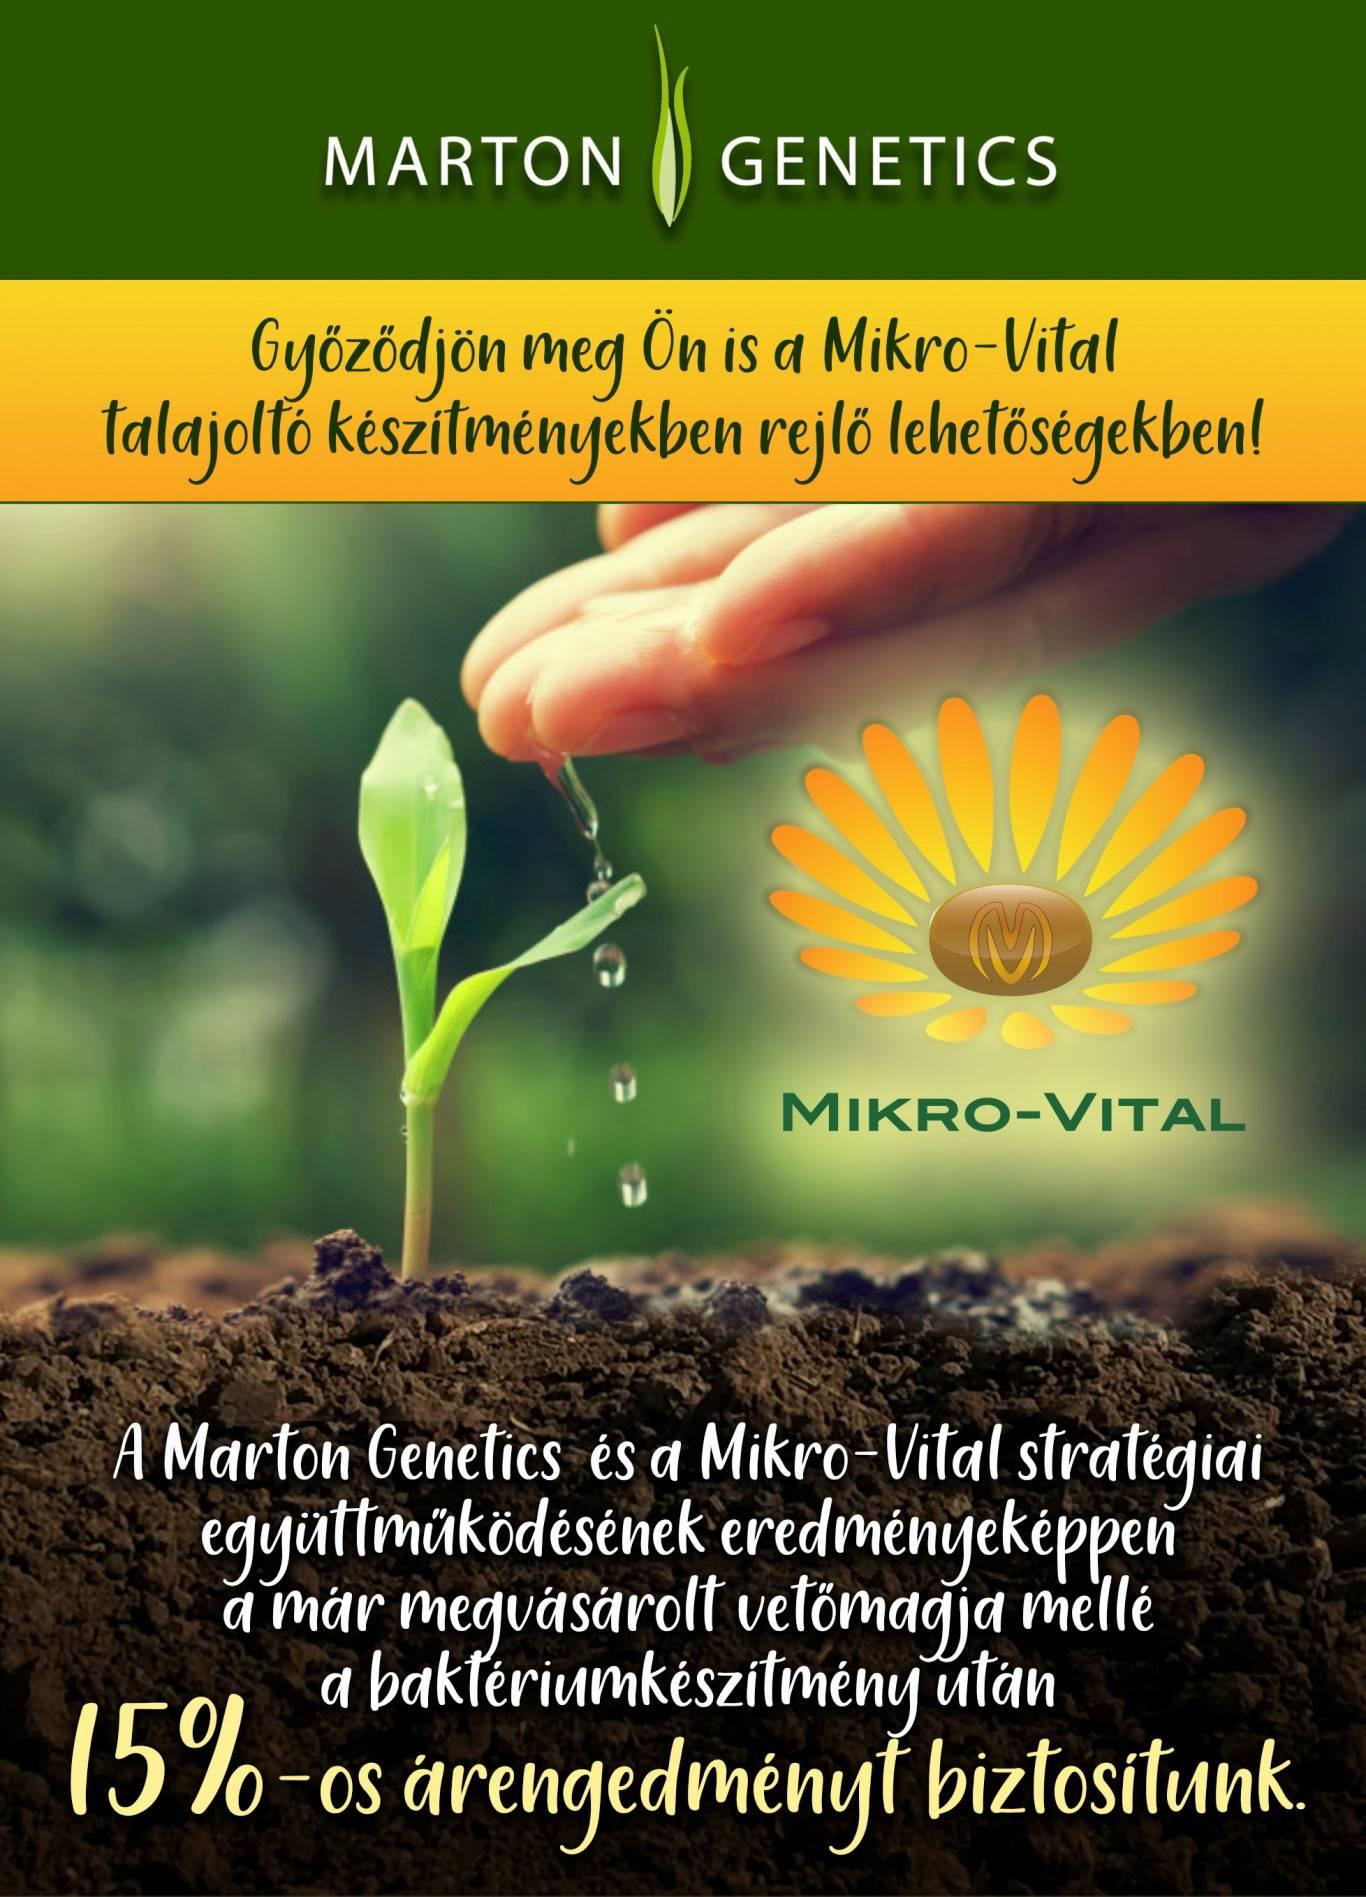 mikro-vital-marton-genetics-logók